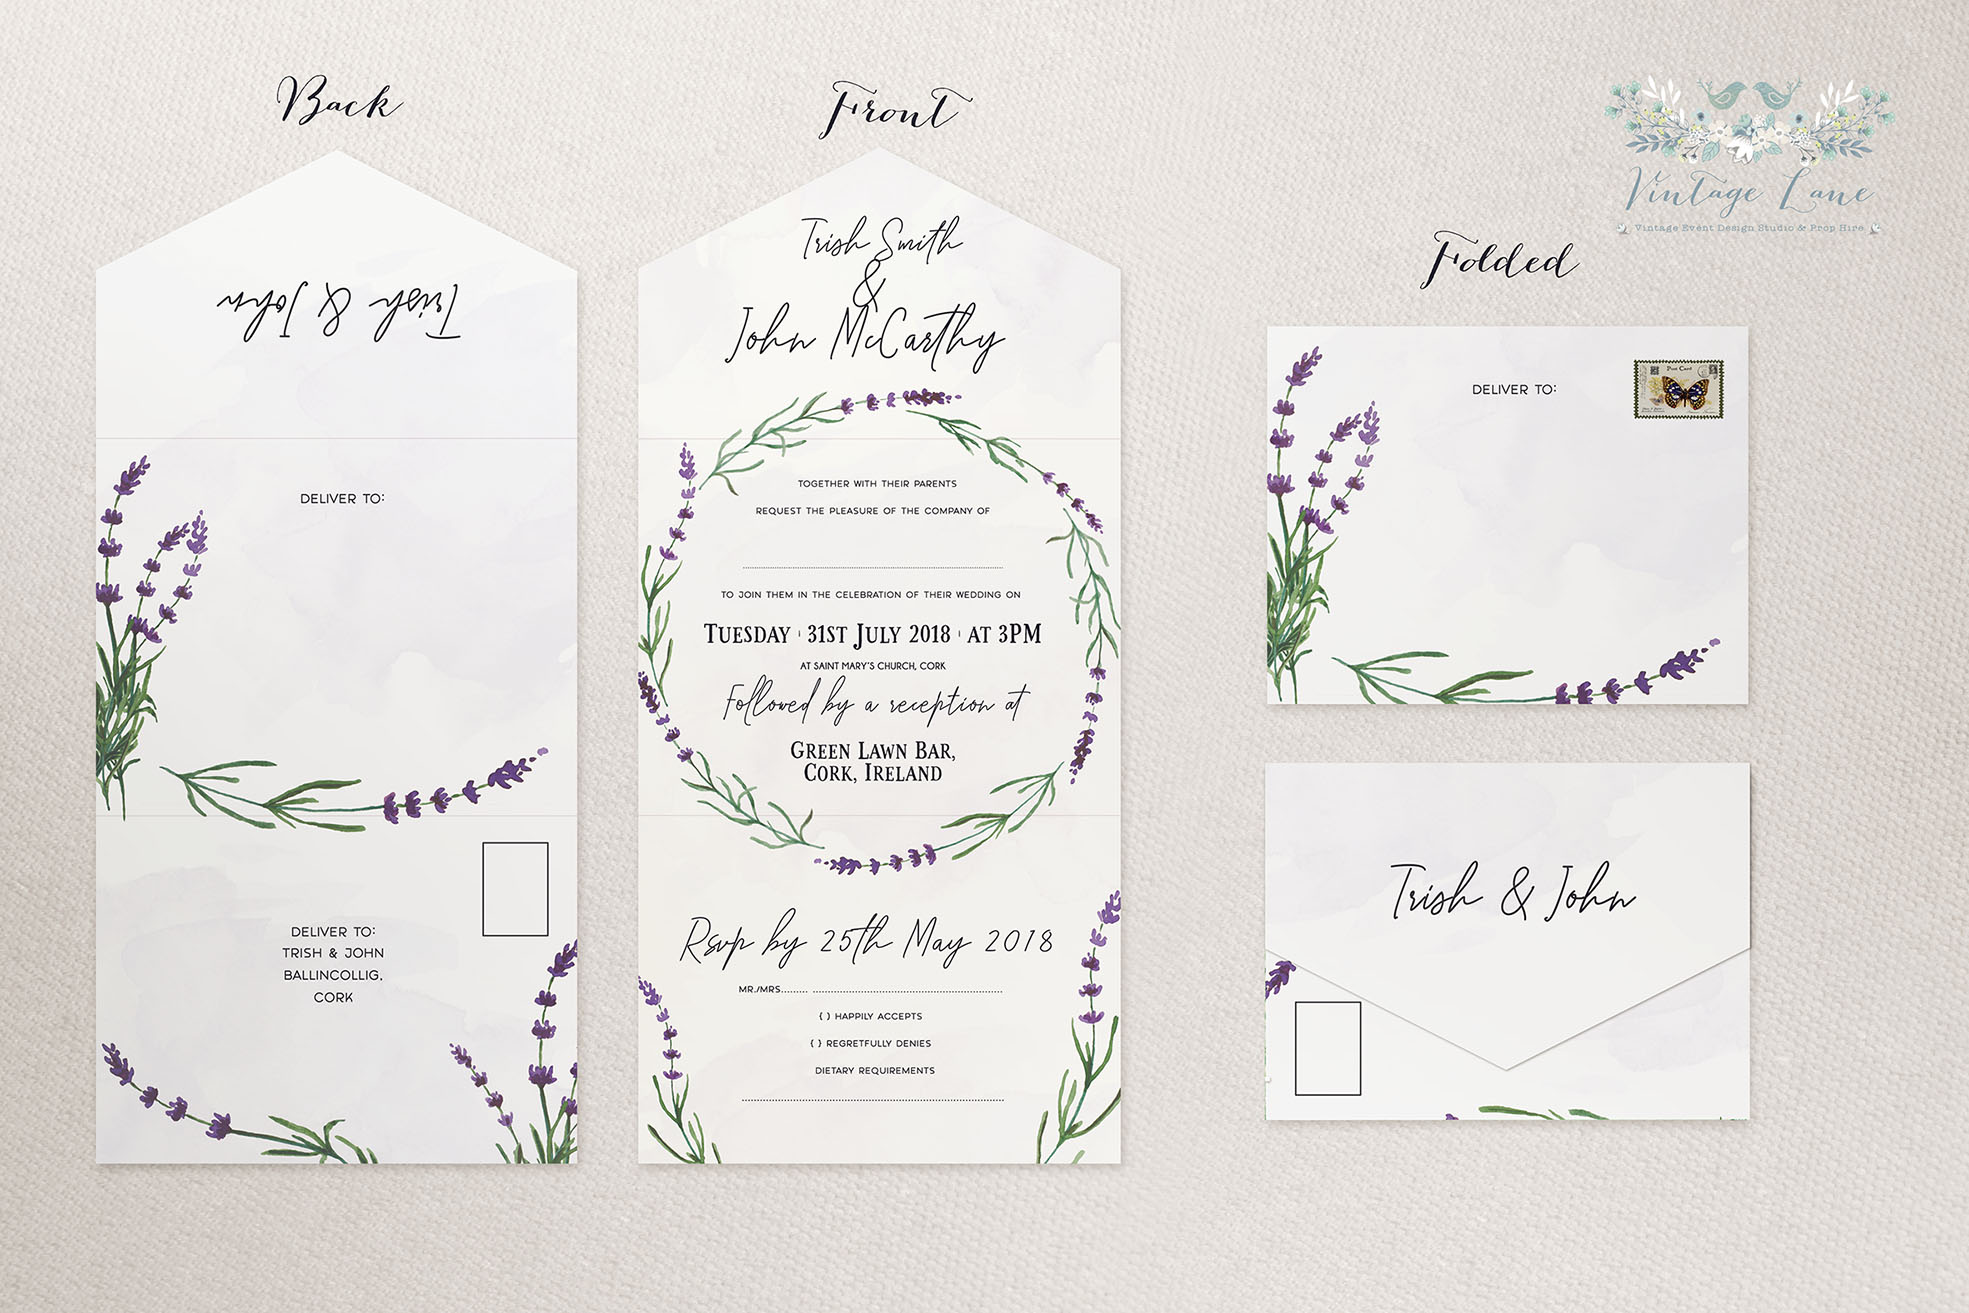 Trifolded Wedding Invitation Independend Graphic Designer Lavender Invitations Rustic Style Modern Cork Ireland: Graphic Designer Wedding Invitations At Reisefeber.org